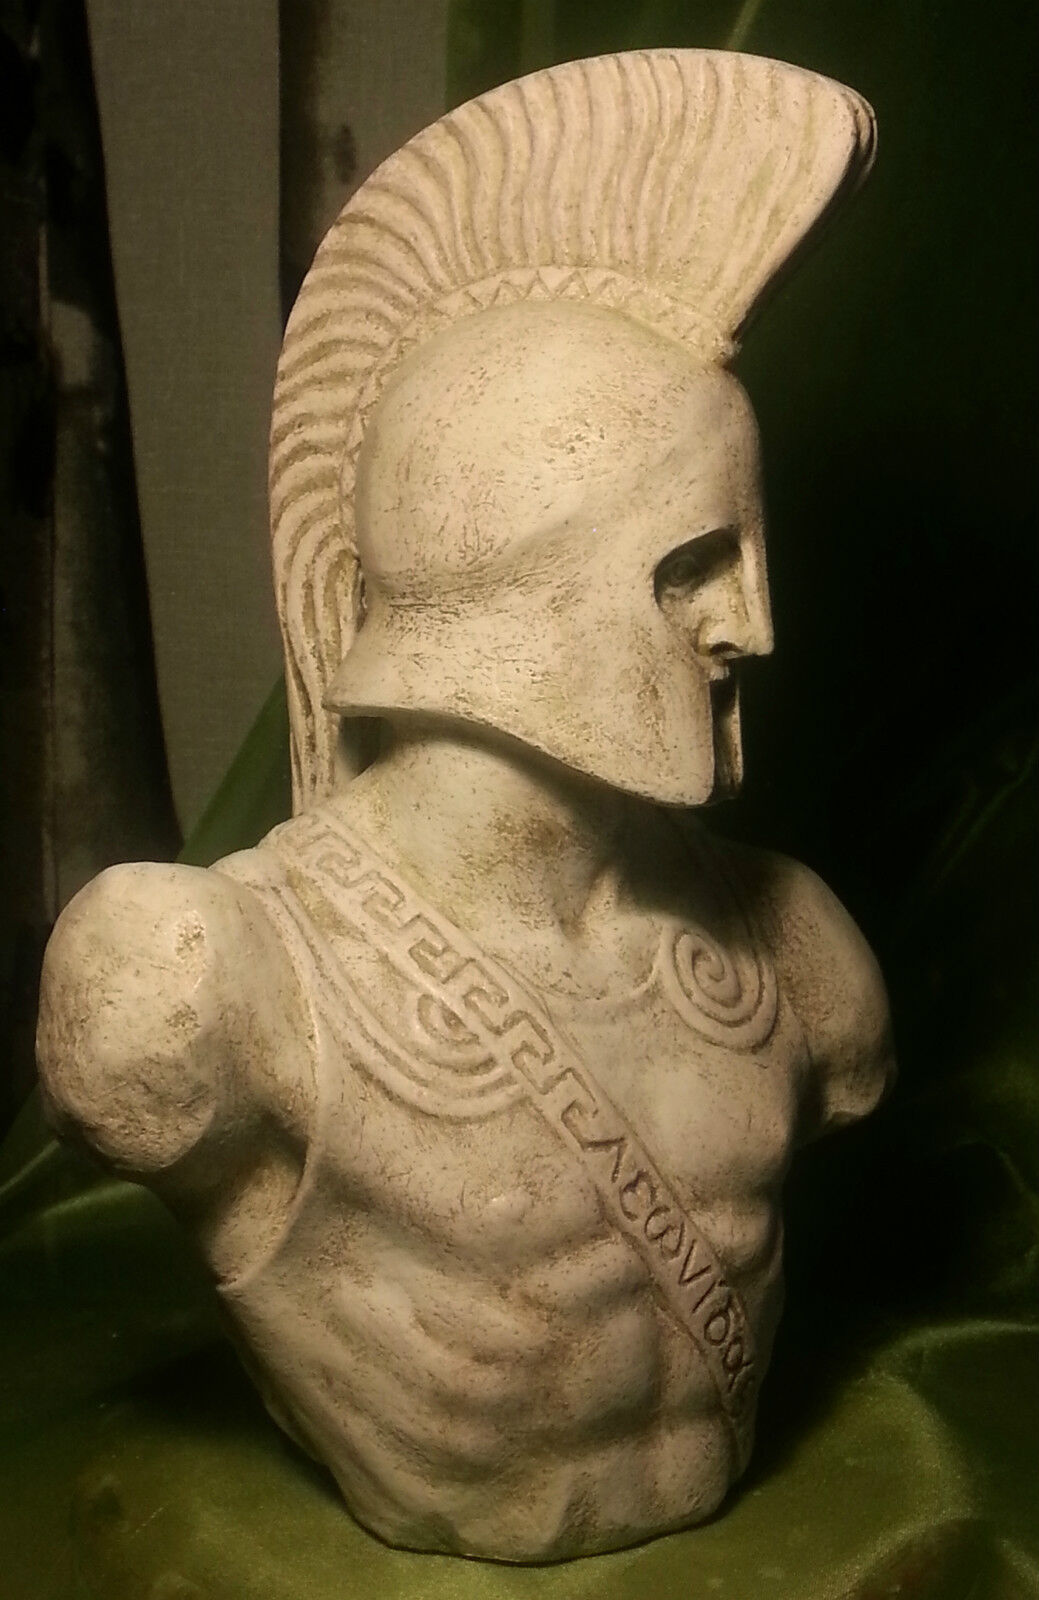 Greek King Leonidas of Sparta Sculpture statue art ornament decor figurine 38 cm